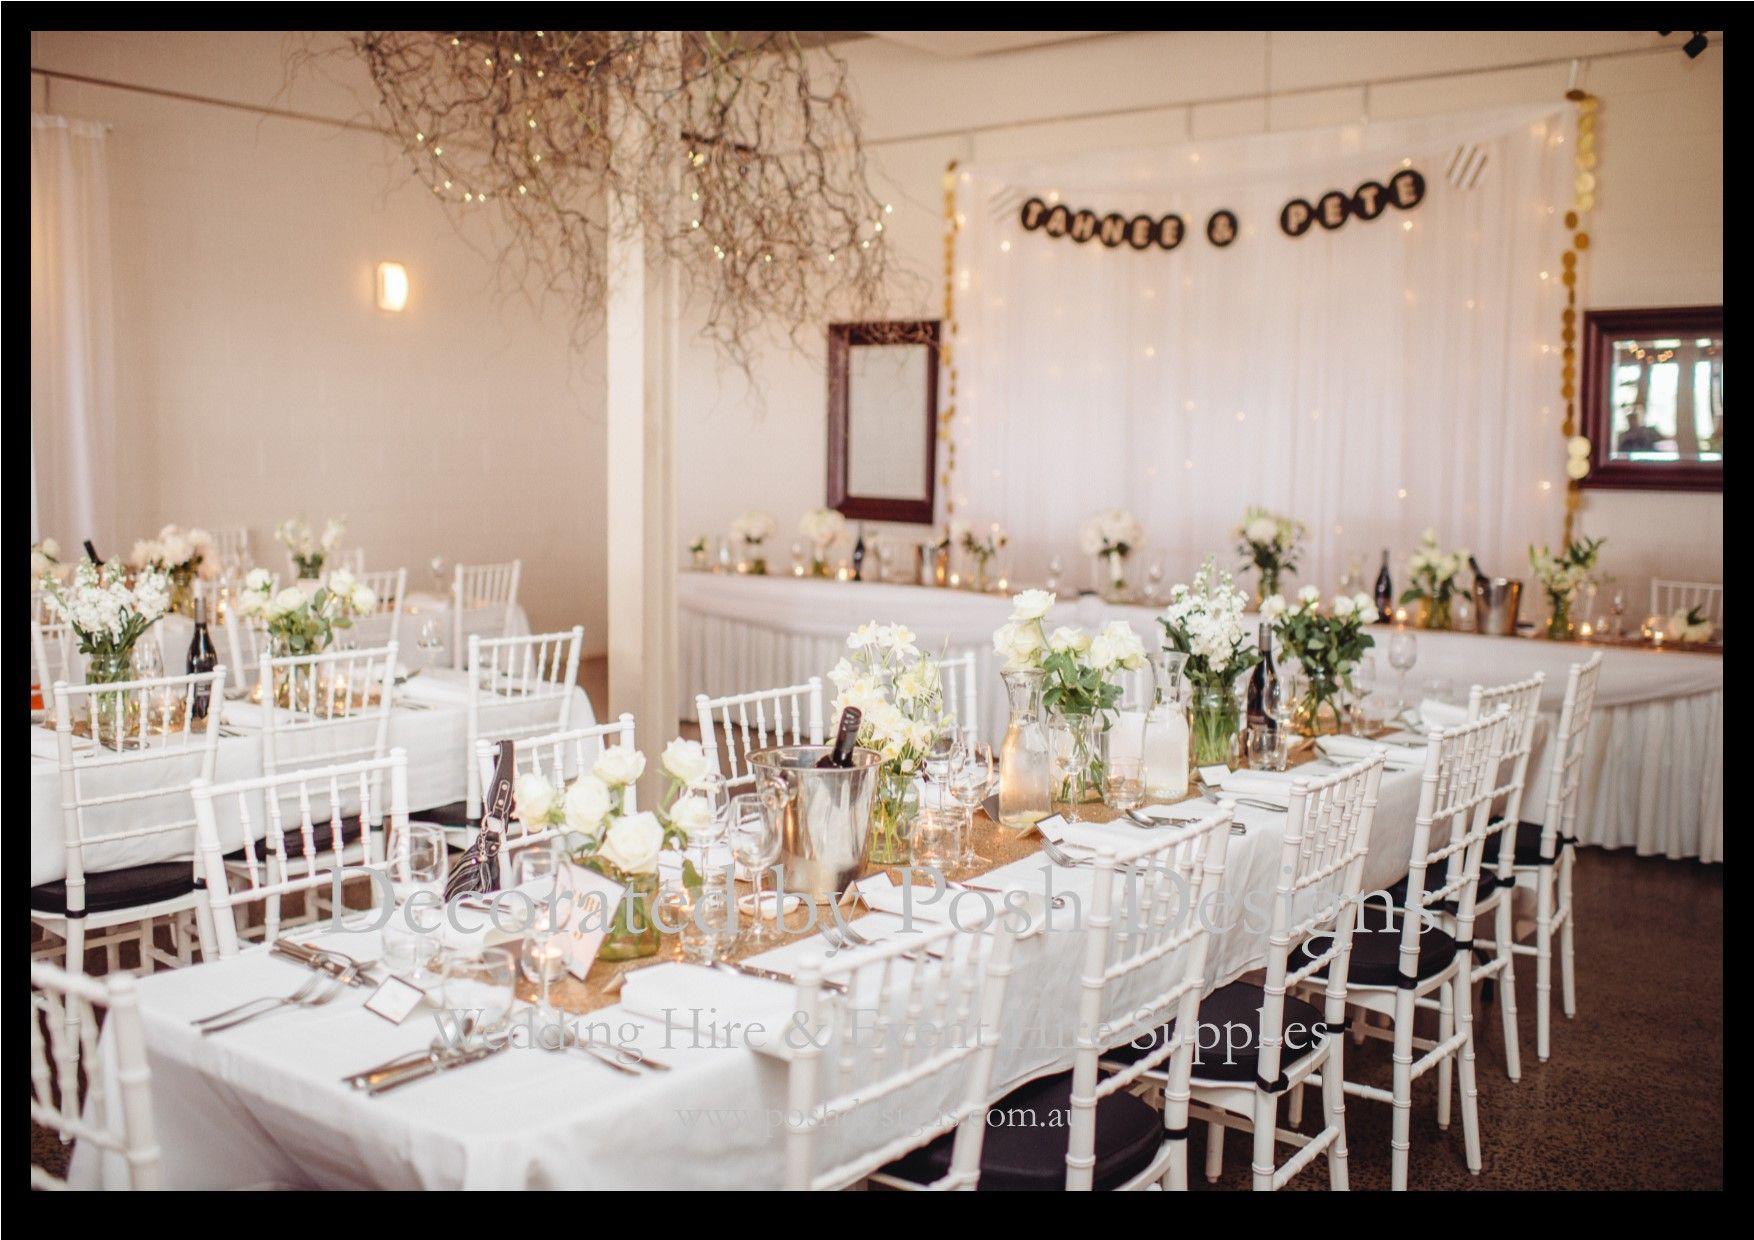 tiffany wedding chairs baby beach chair sash google search the decor